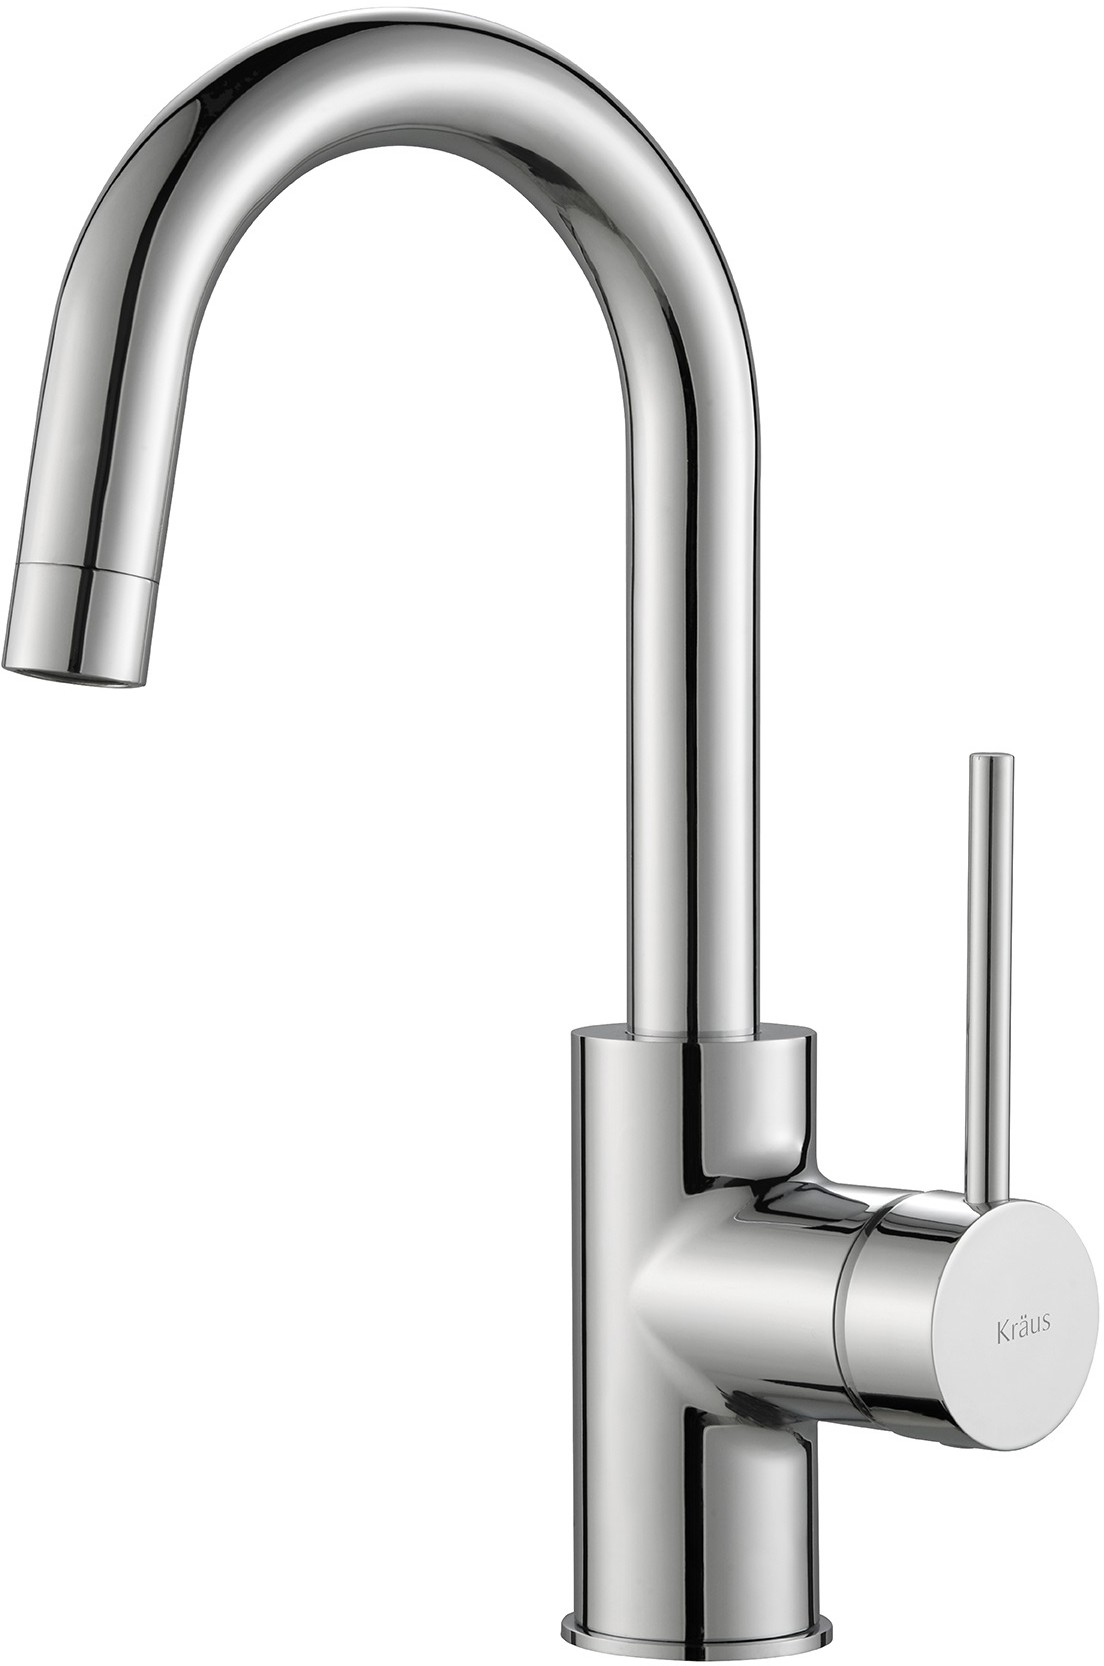 orion di water faucet orion di water faucet kraus ada compliant sinks faucets 1104 x 1666